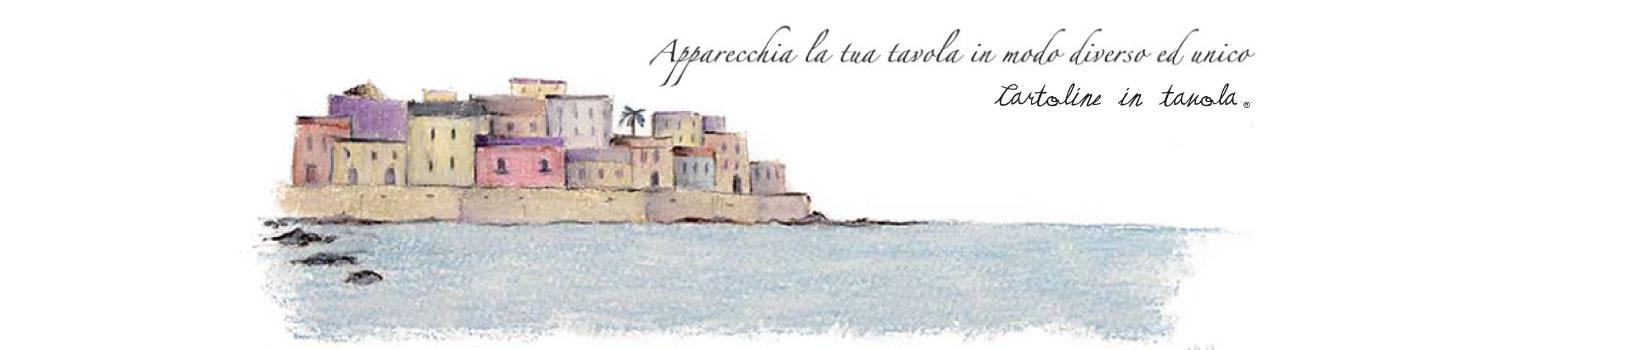 Cartoline In Tavola